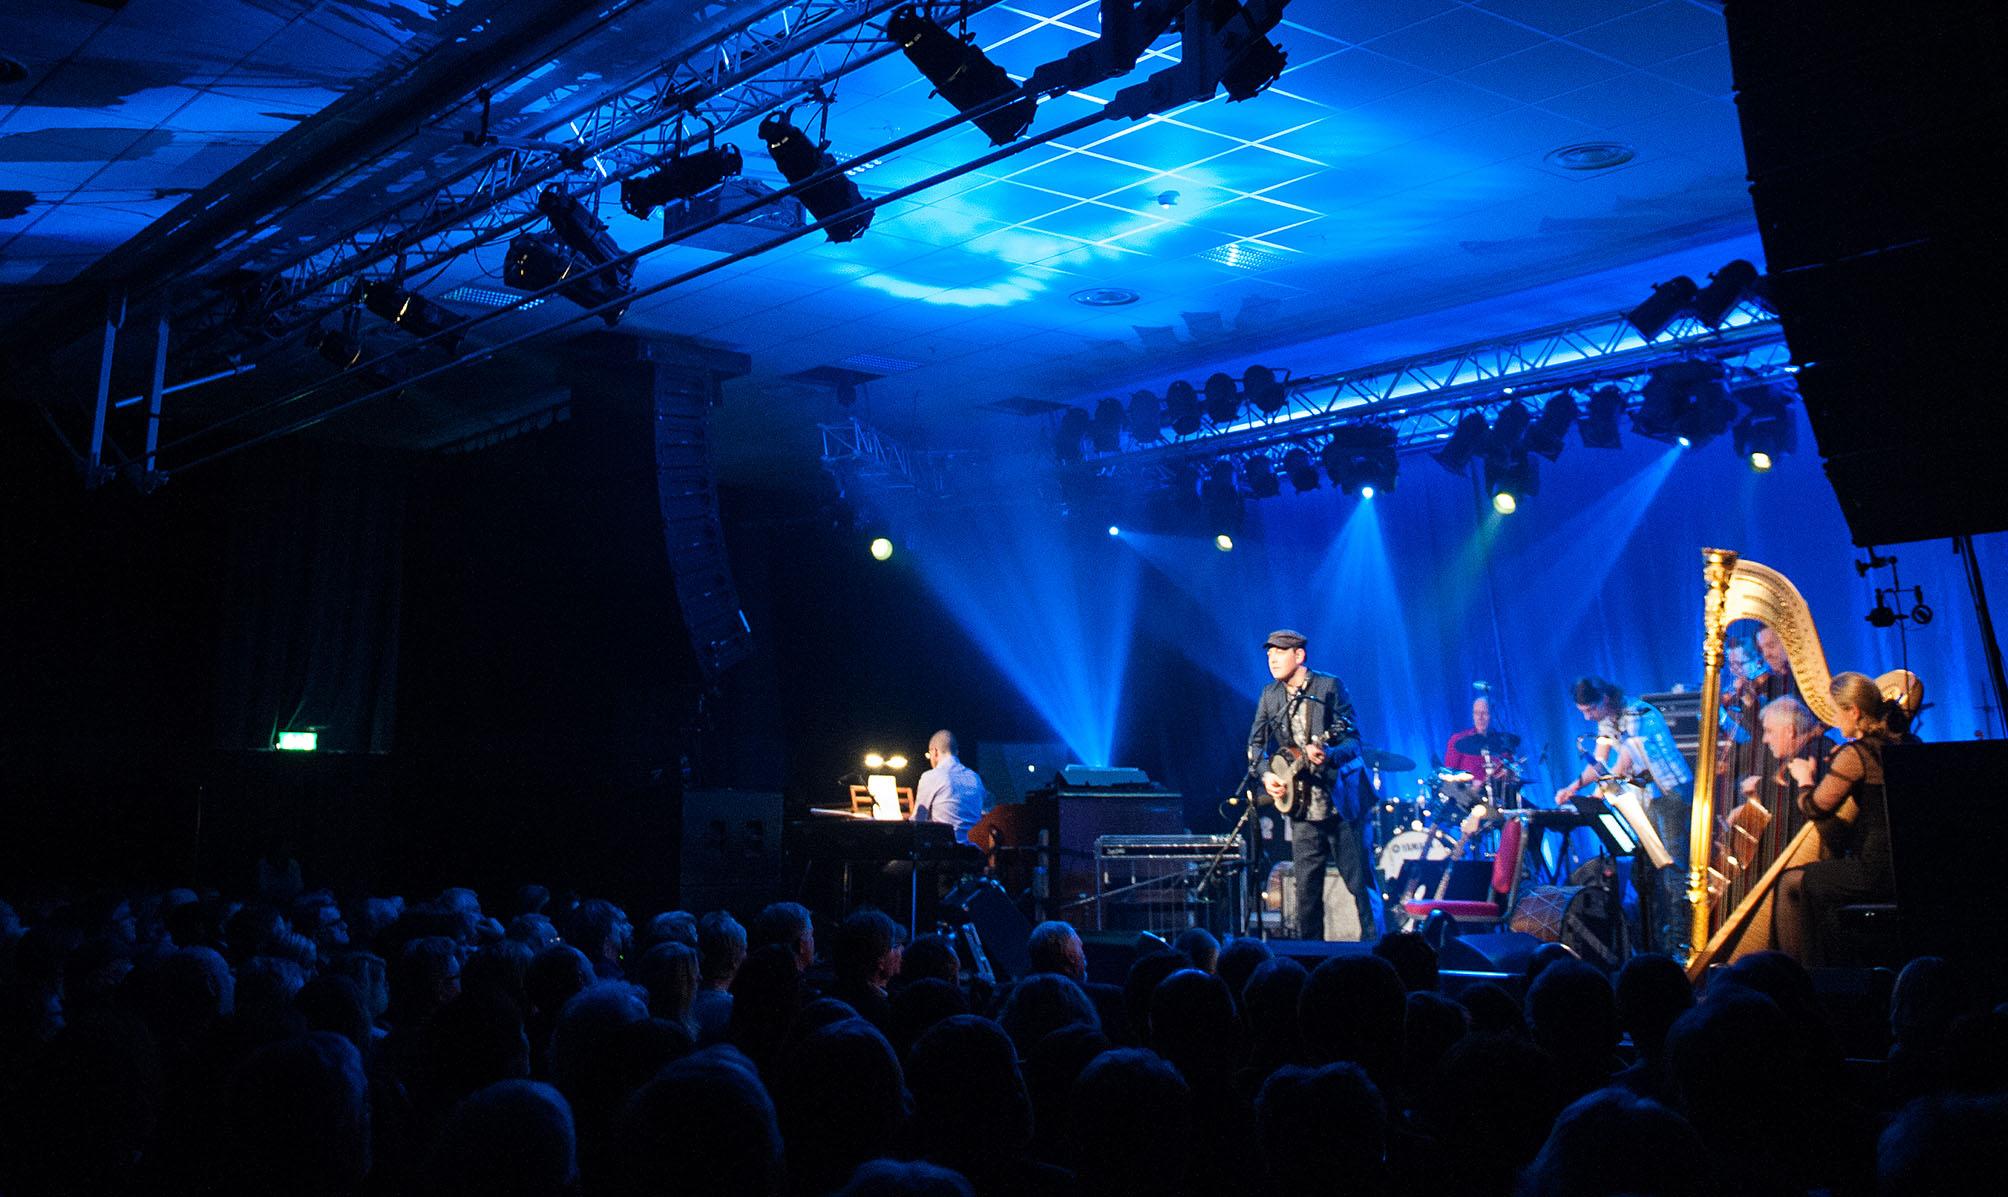 Stian Carstensen Commission, 2013 Vossa Jazz Festival